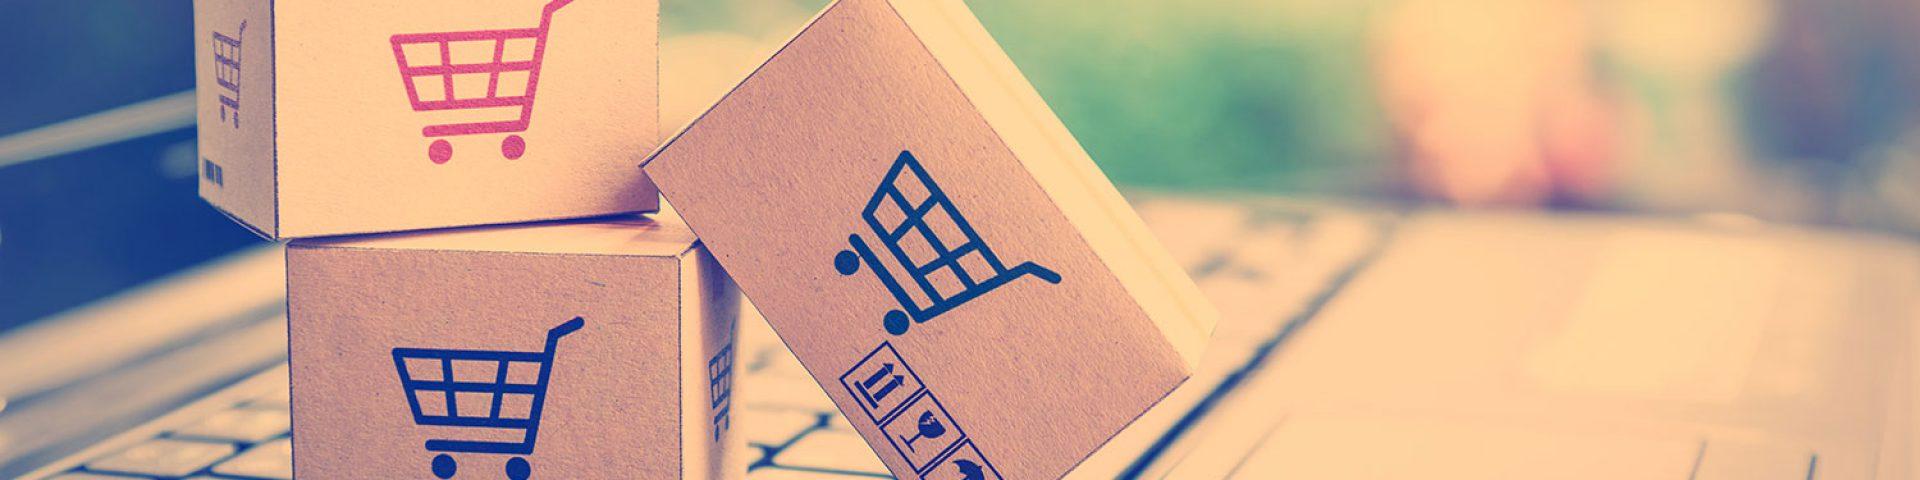 Development of e-commerce solutions